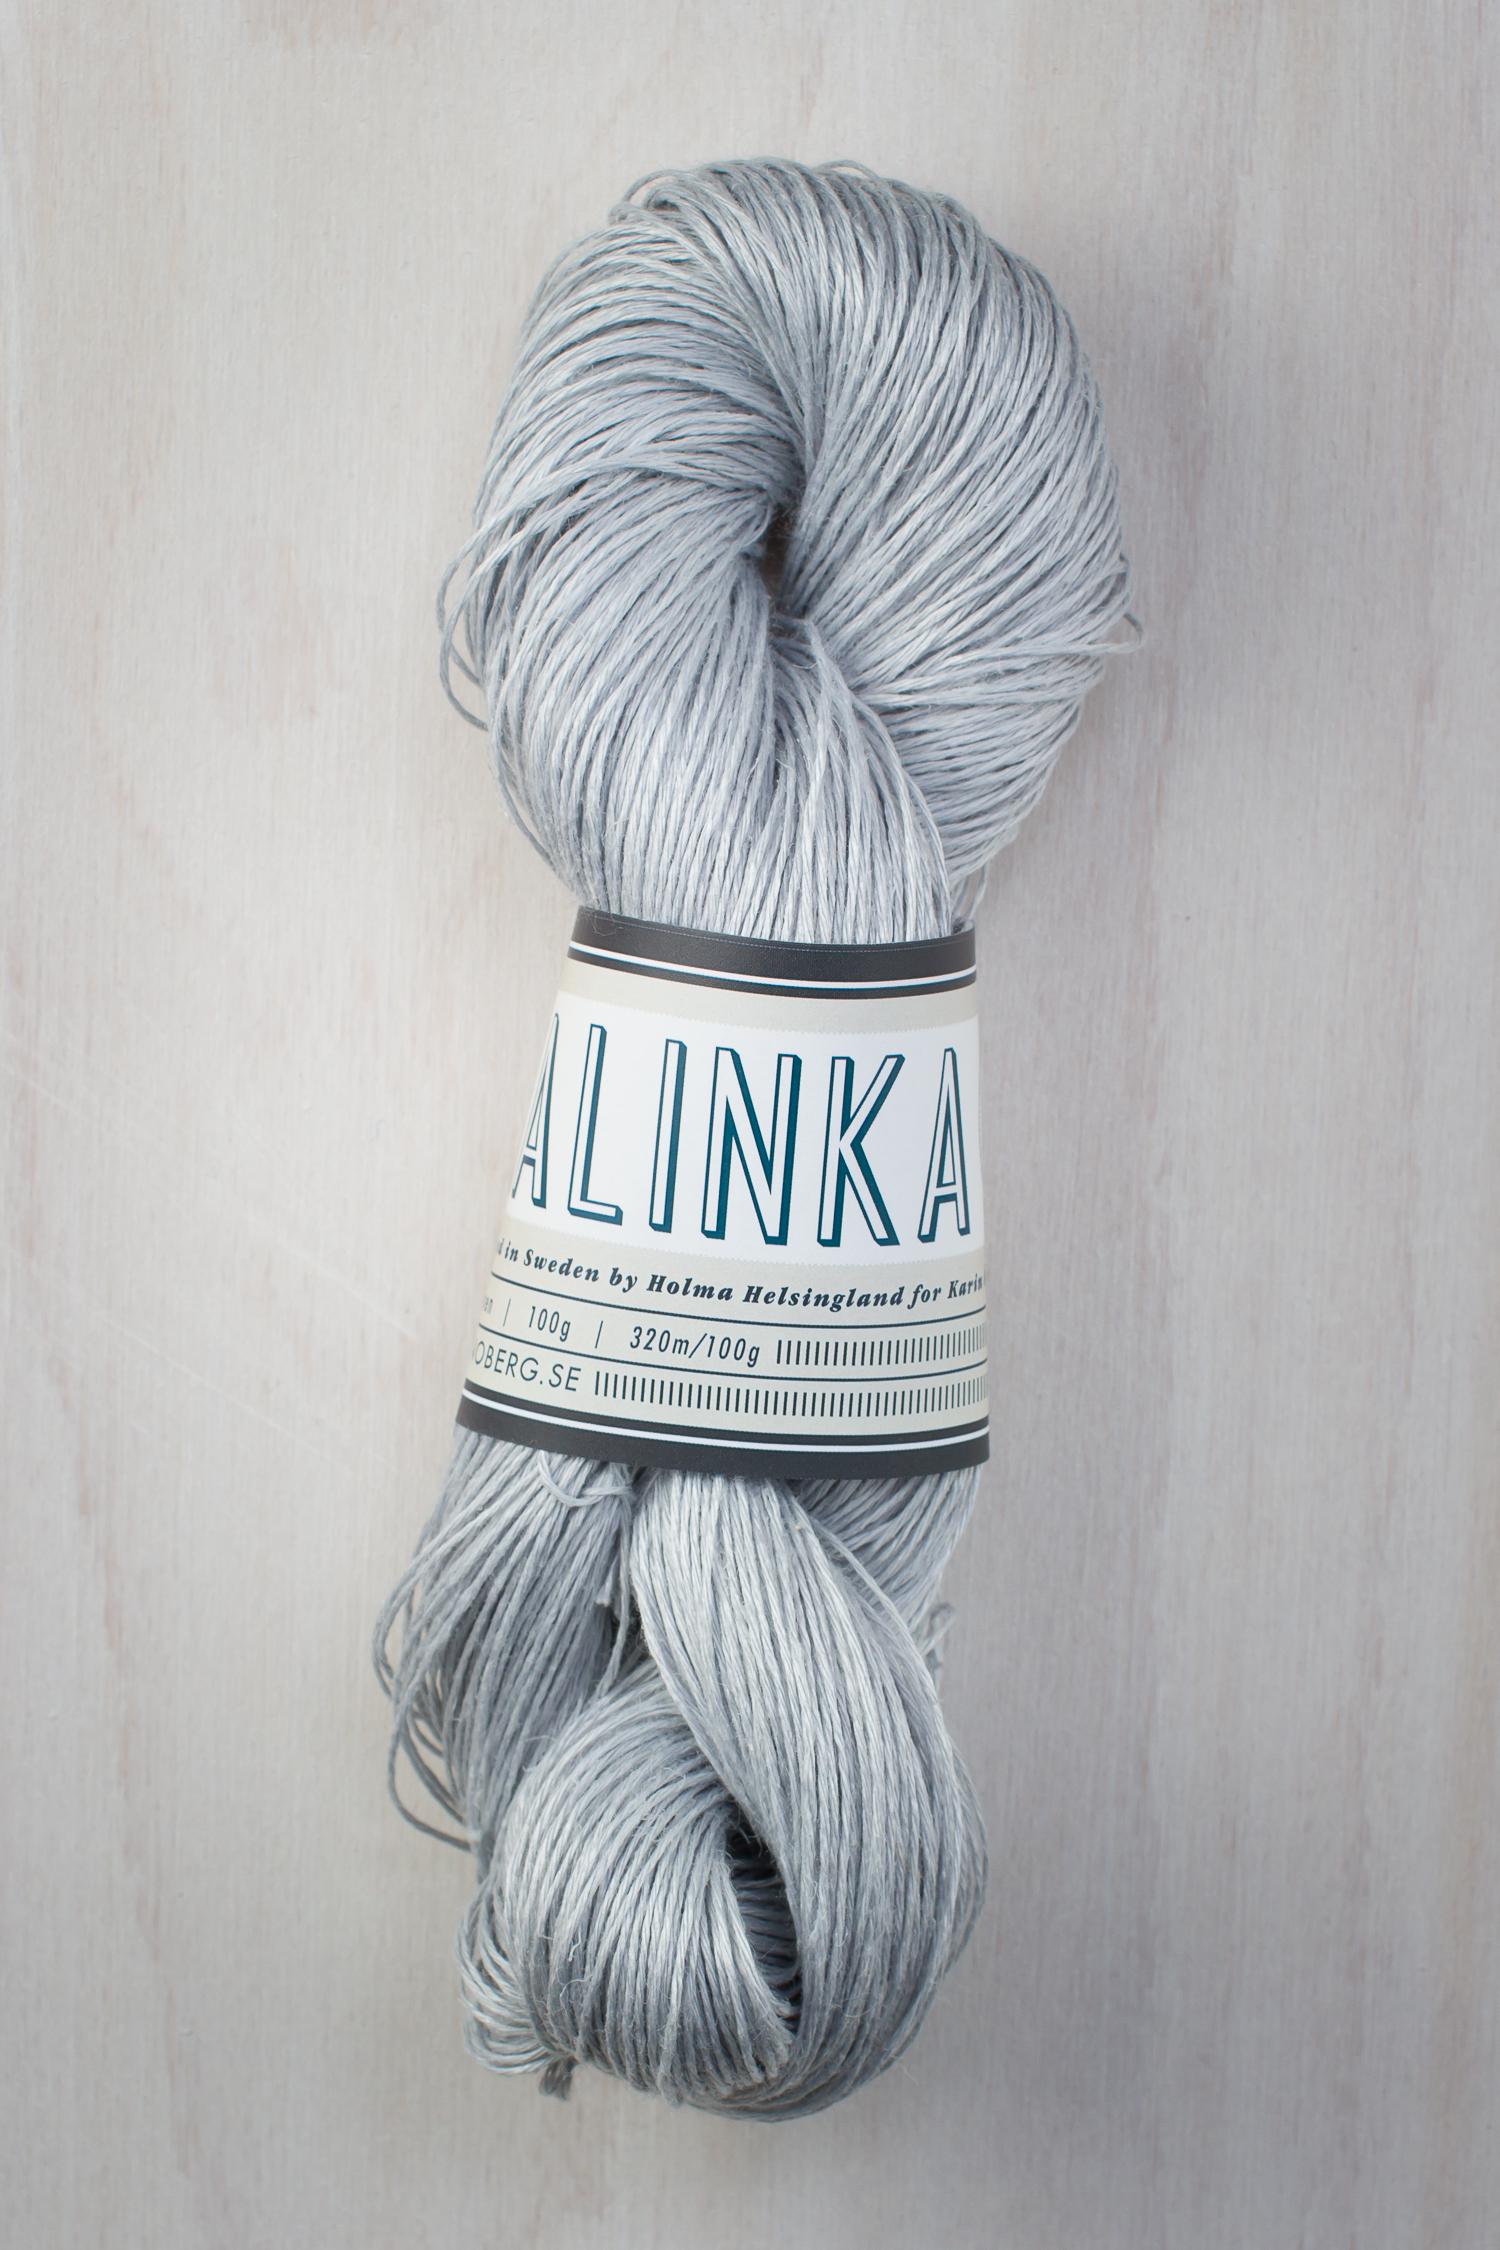 Silvergrå, 100g